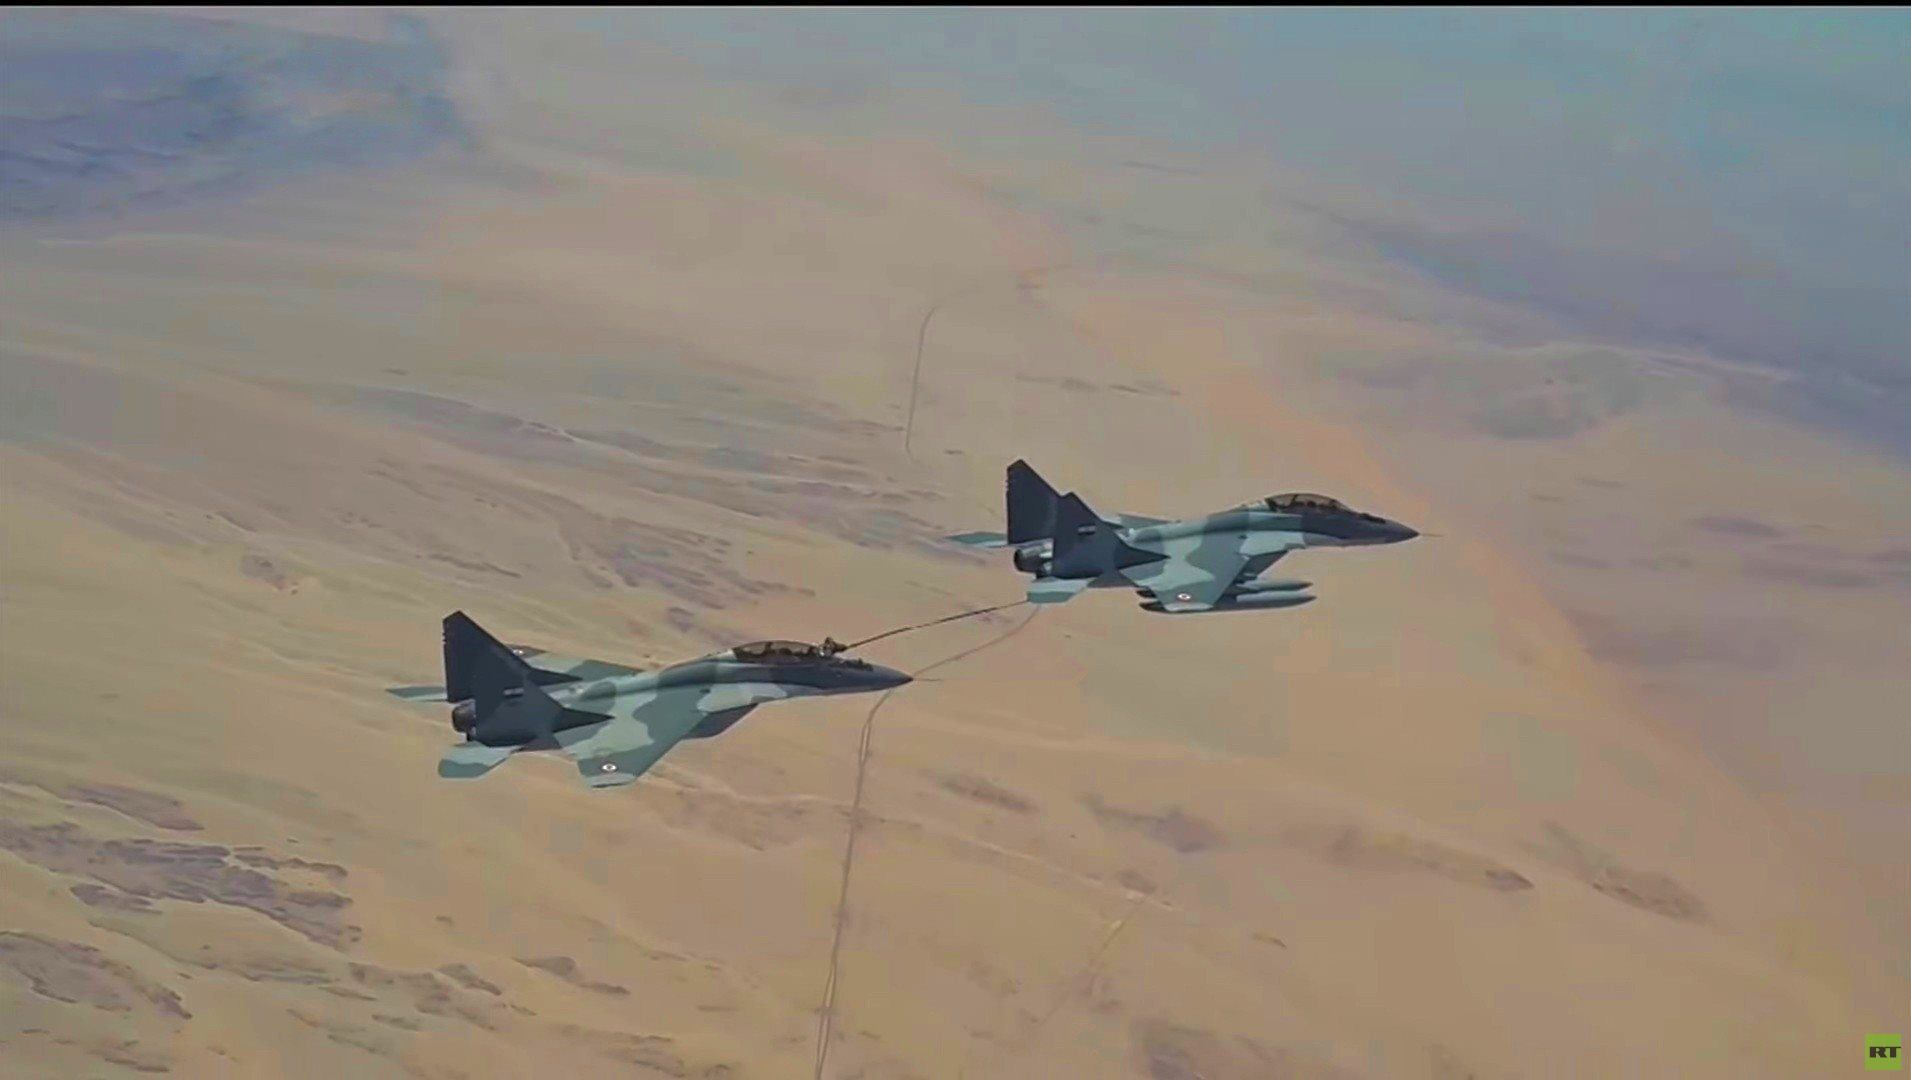 مصر.. ظهور مقاتلات خلال مناورات